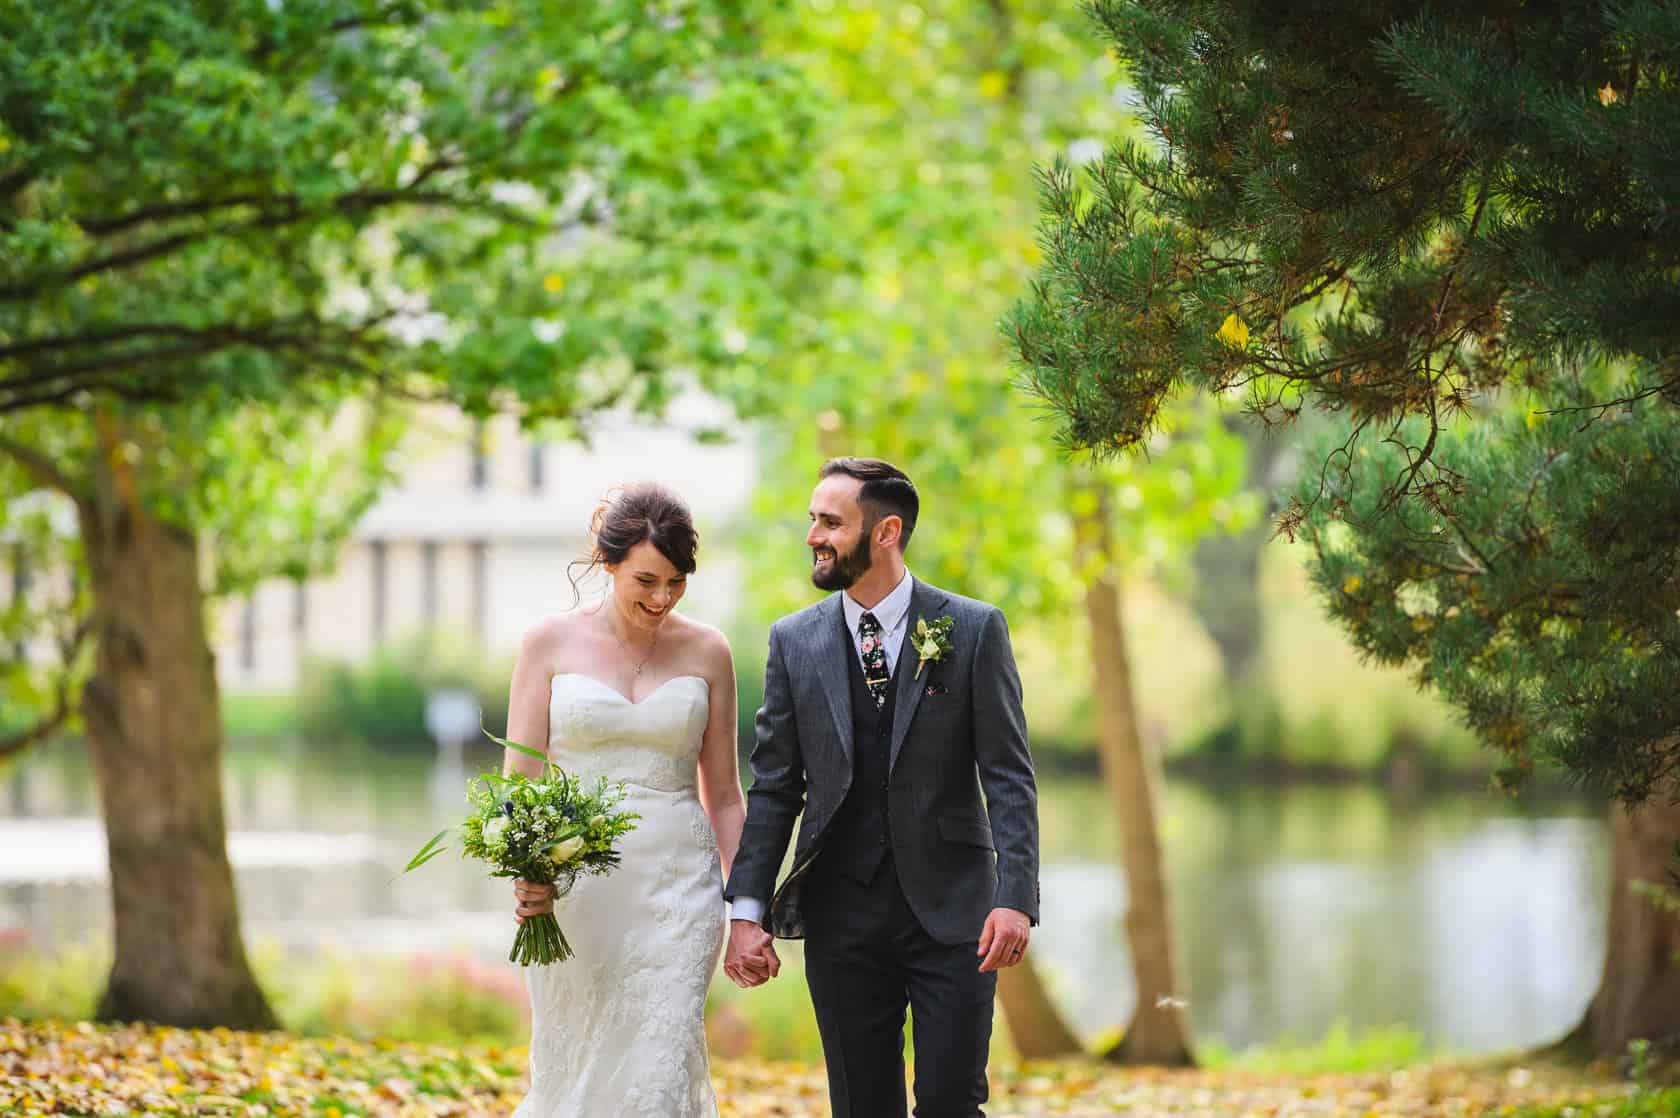 Best_Wedding_Photography_2019_Wedding-Photographer-Essex_028